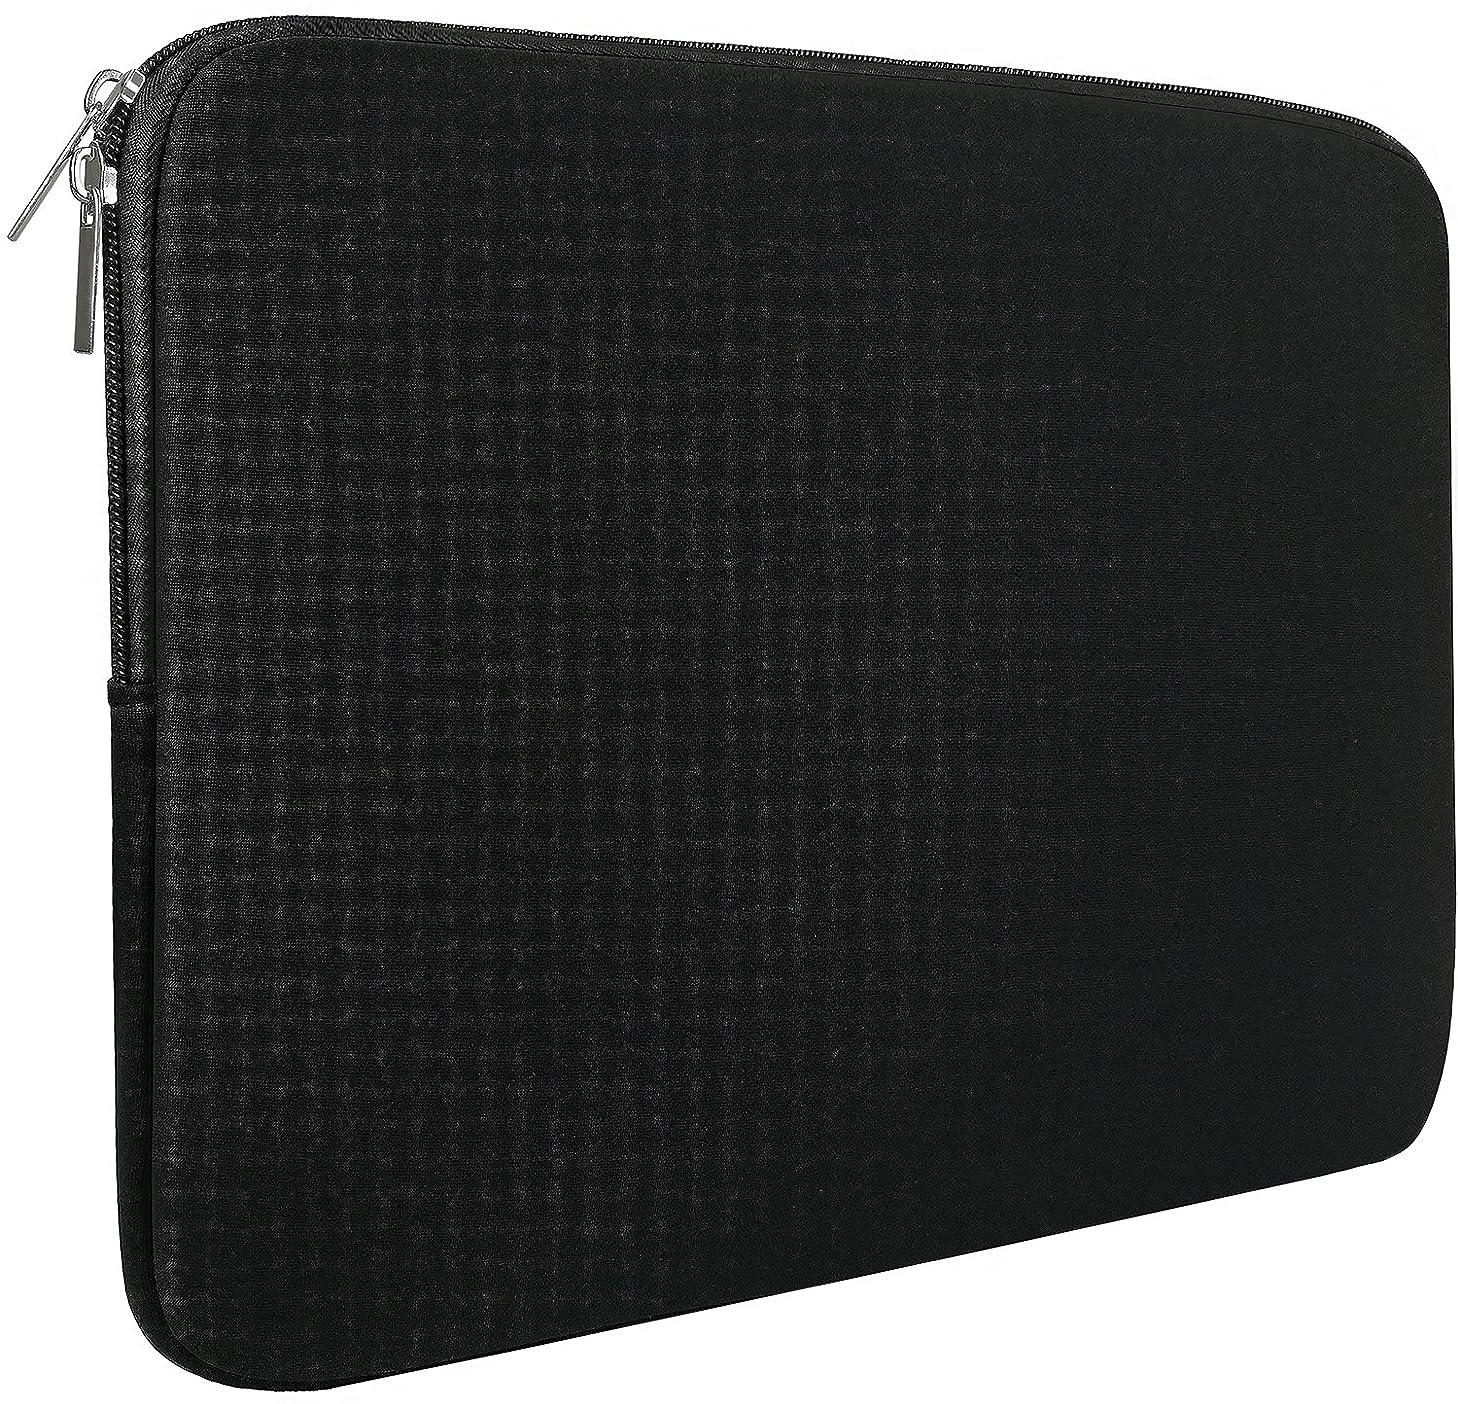 Naukay Laptop Bag 15 Inch, Resistant Neoprene Laptop Sleeve/Notebook Computer Pocket Case/Tablet Briefcase Carrying Bag Compatible for 15 inch MacBook Pro,Laptop, Ultrabook Notebook - (Black)